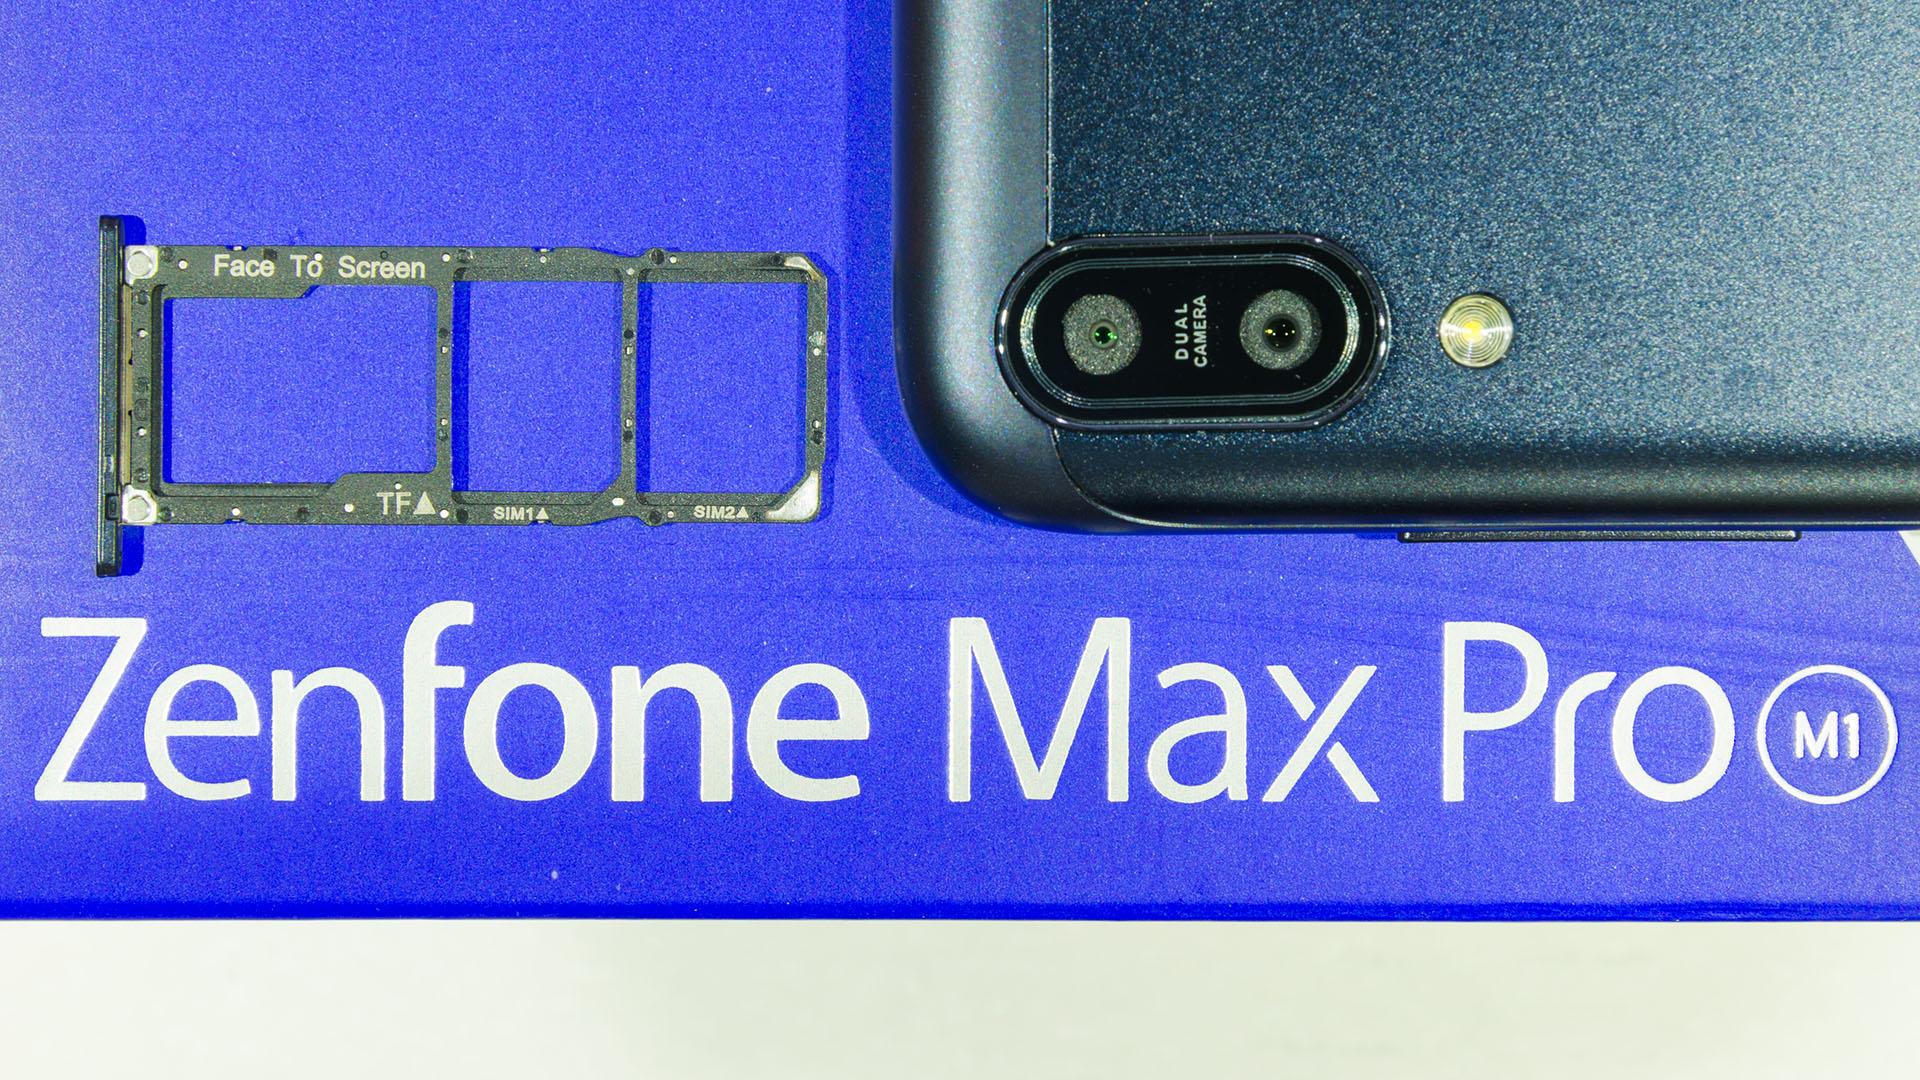 Review - ASUS ZenFone Max Pro (M1): Unbelievably Low Price